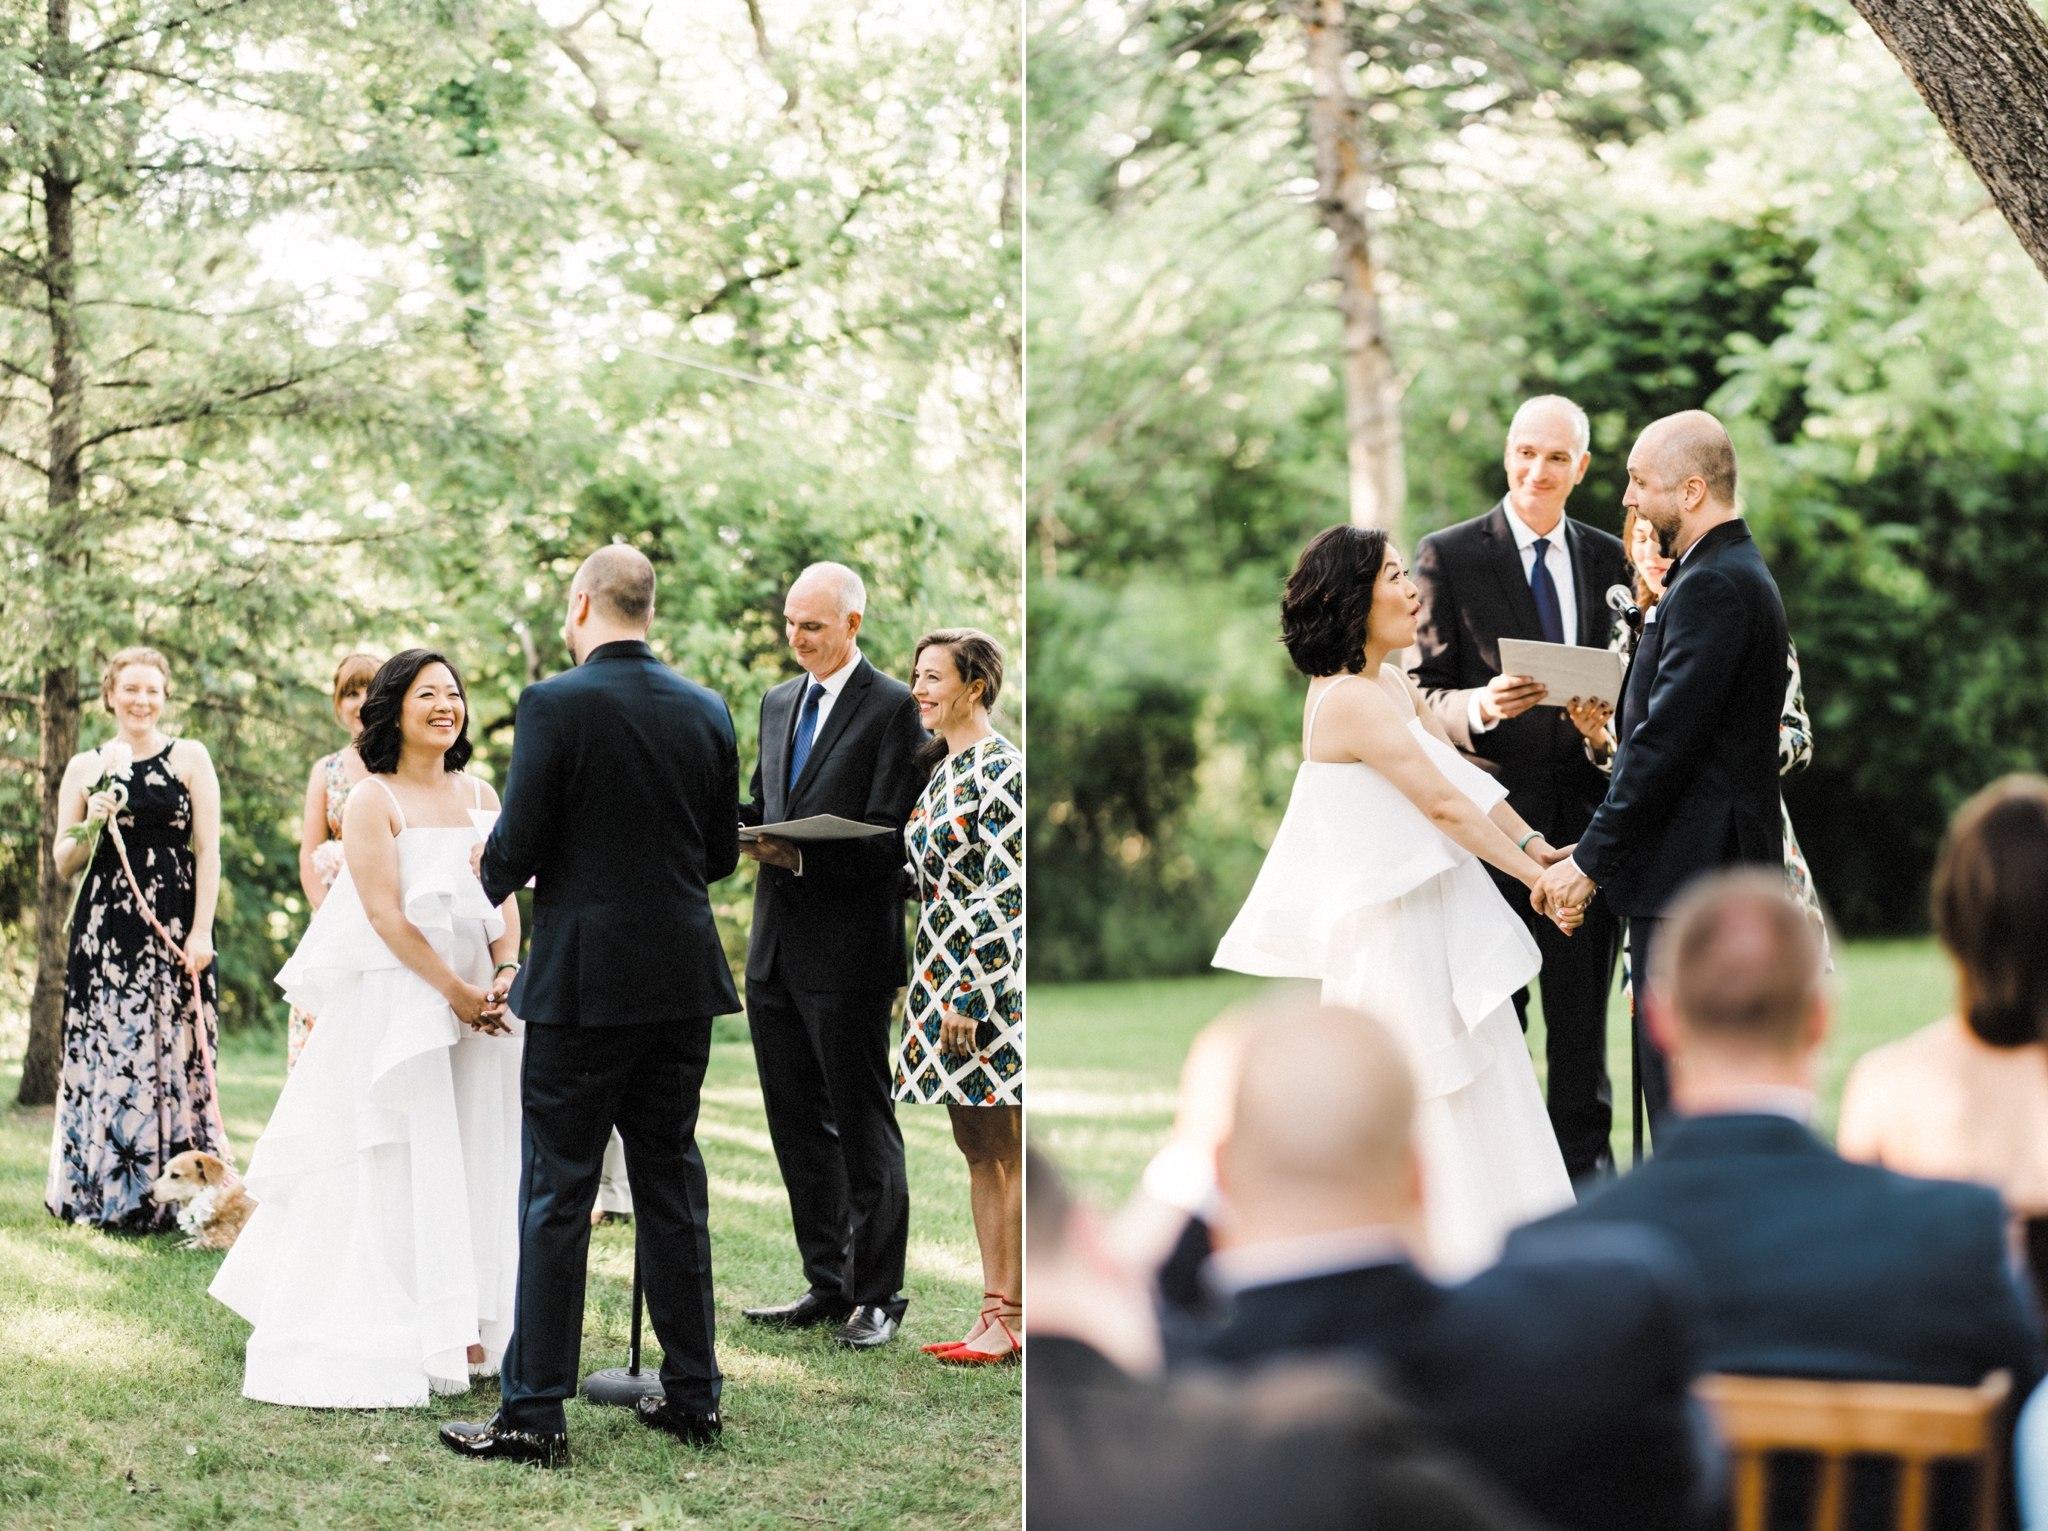 Illinois_backyard_wedding_0011.jpg